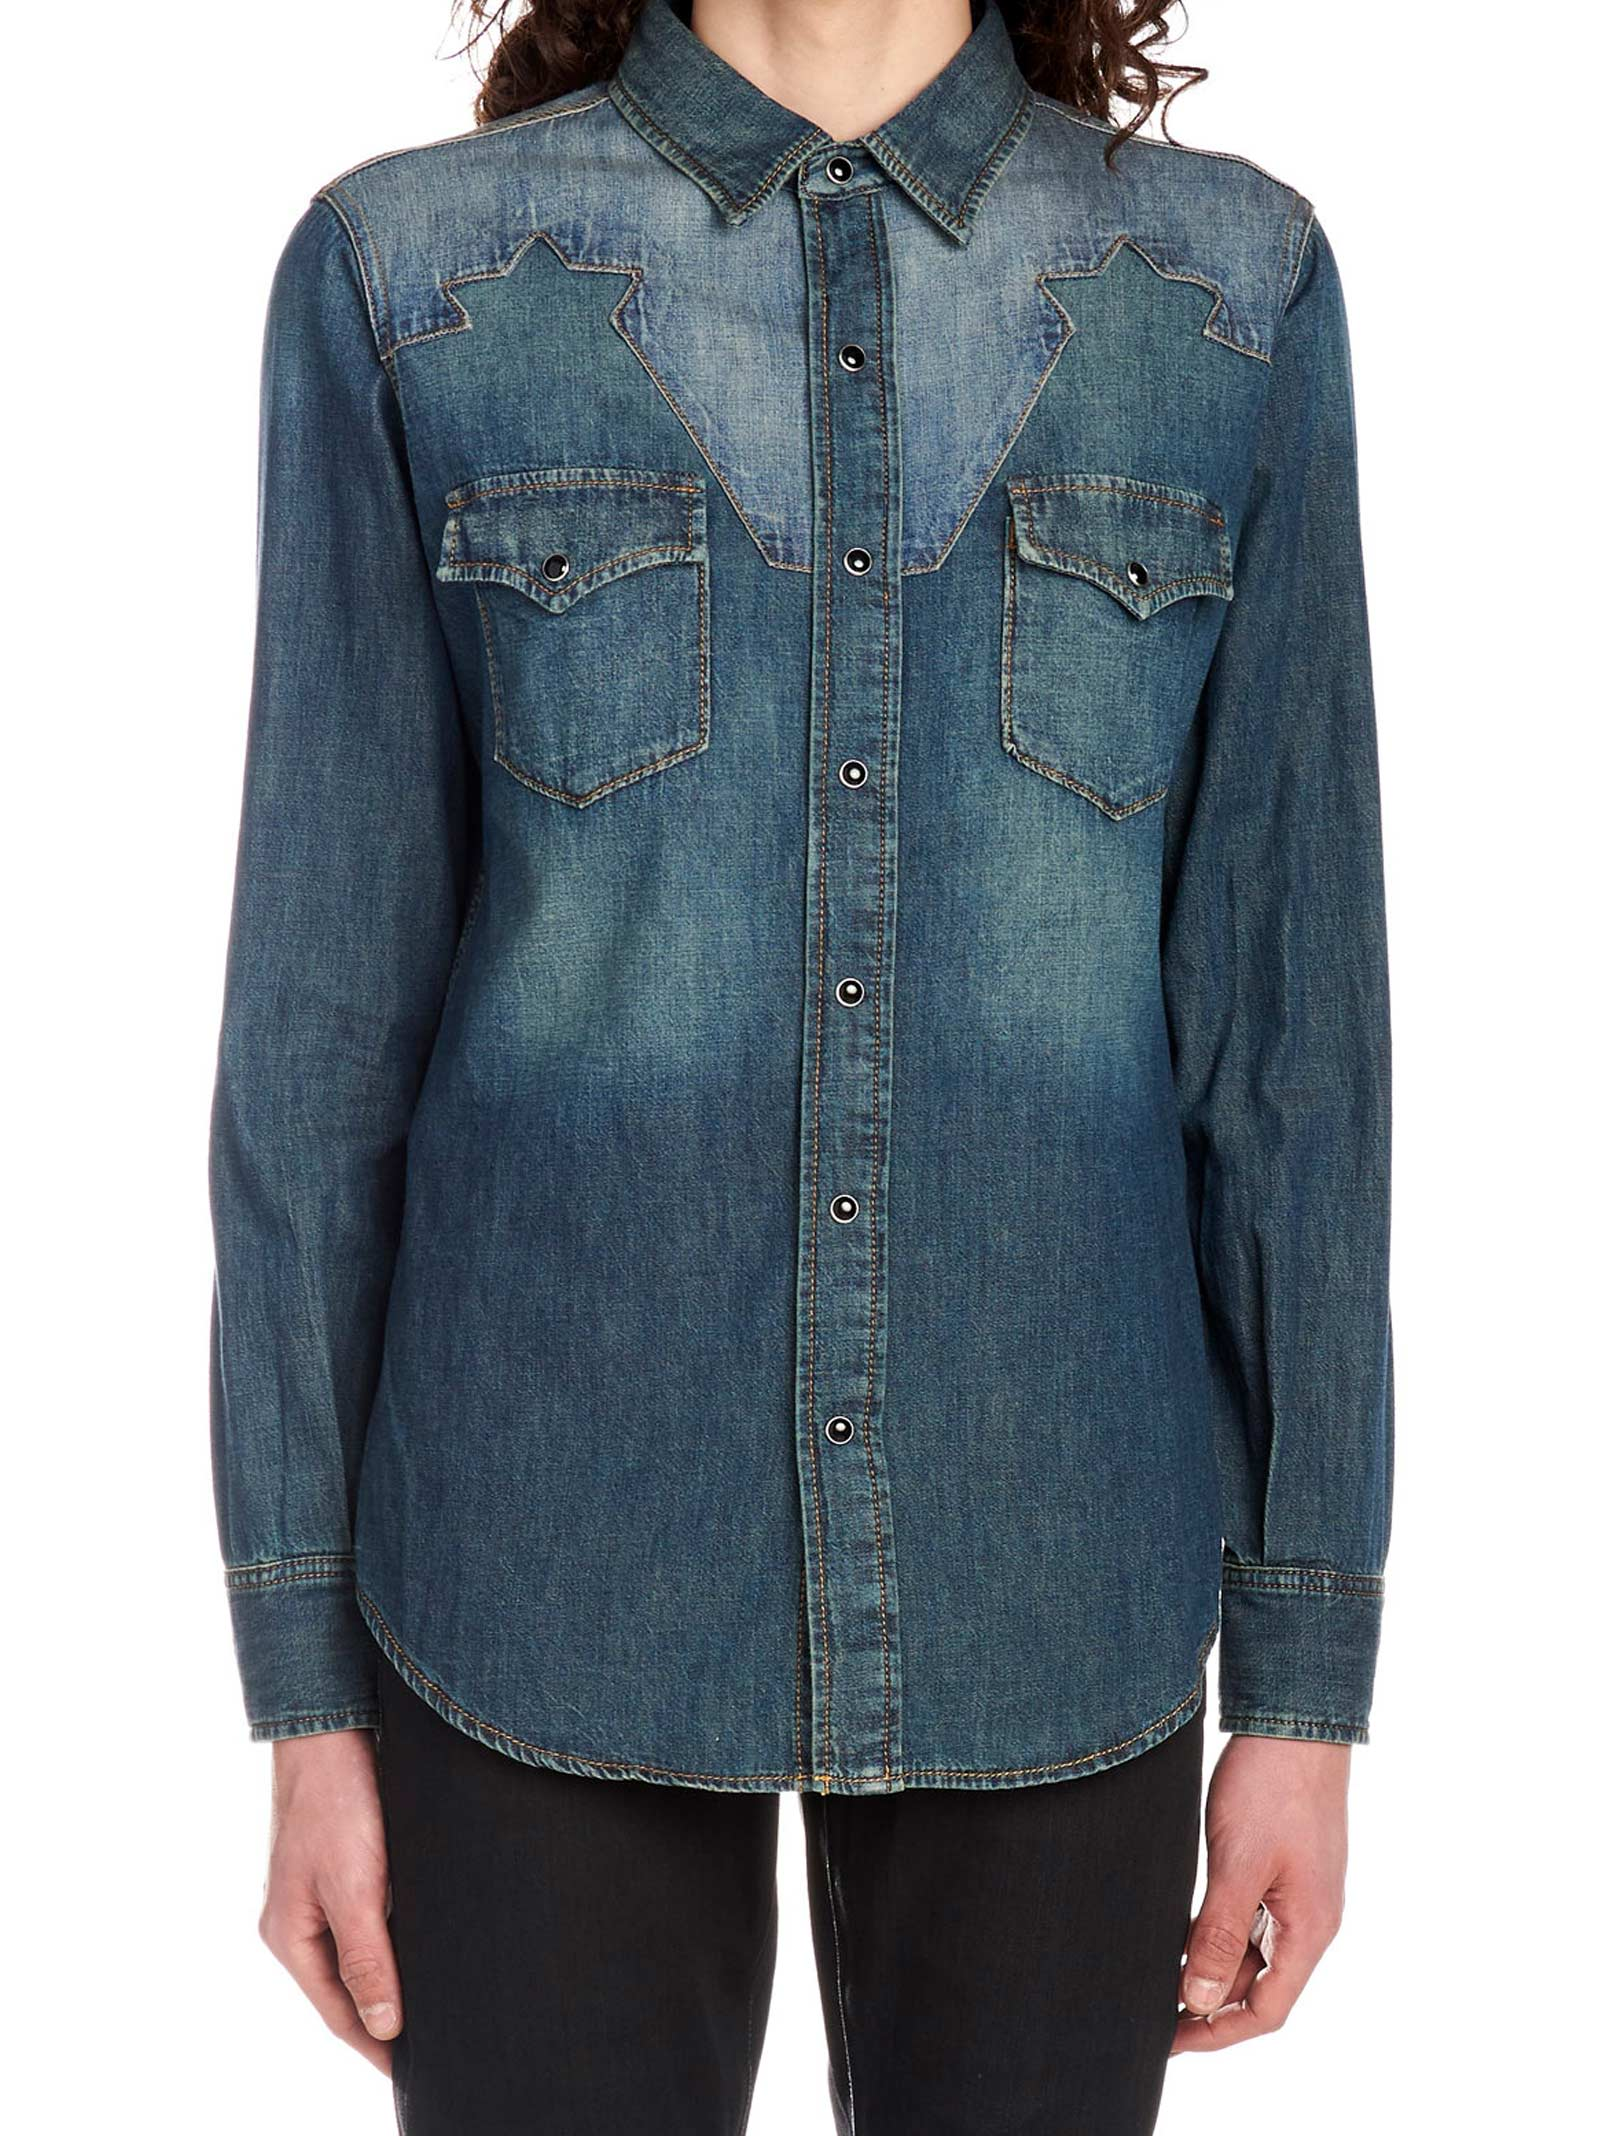 Saint Laurent 'classic Western' Shirt